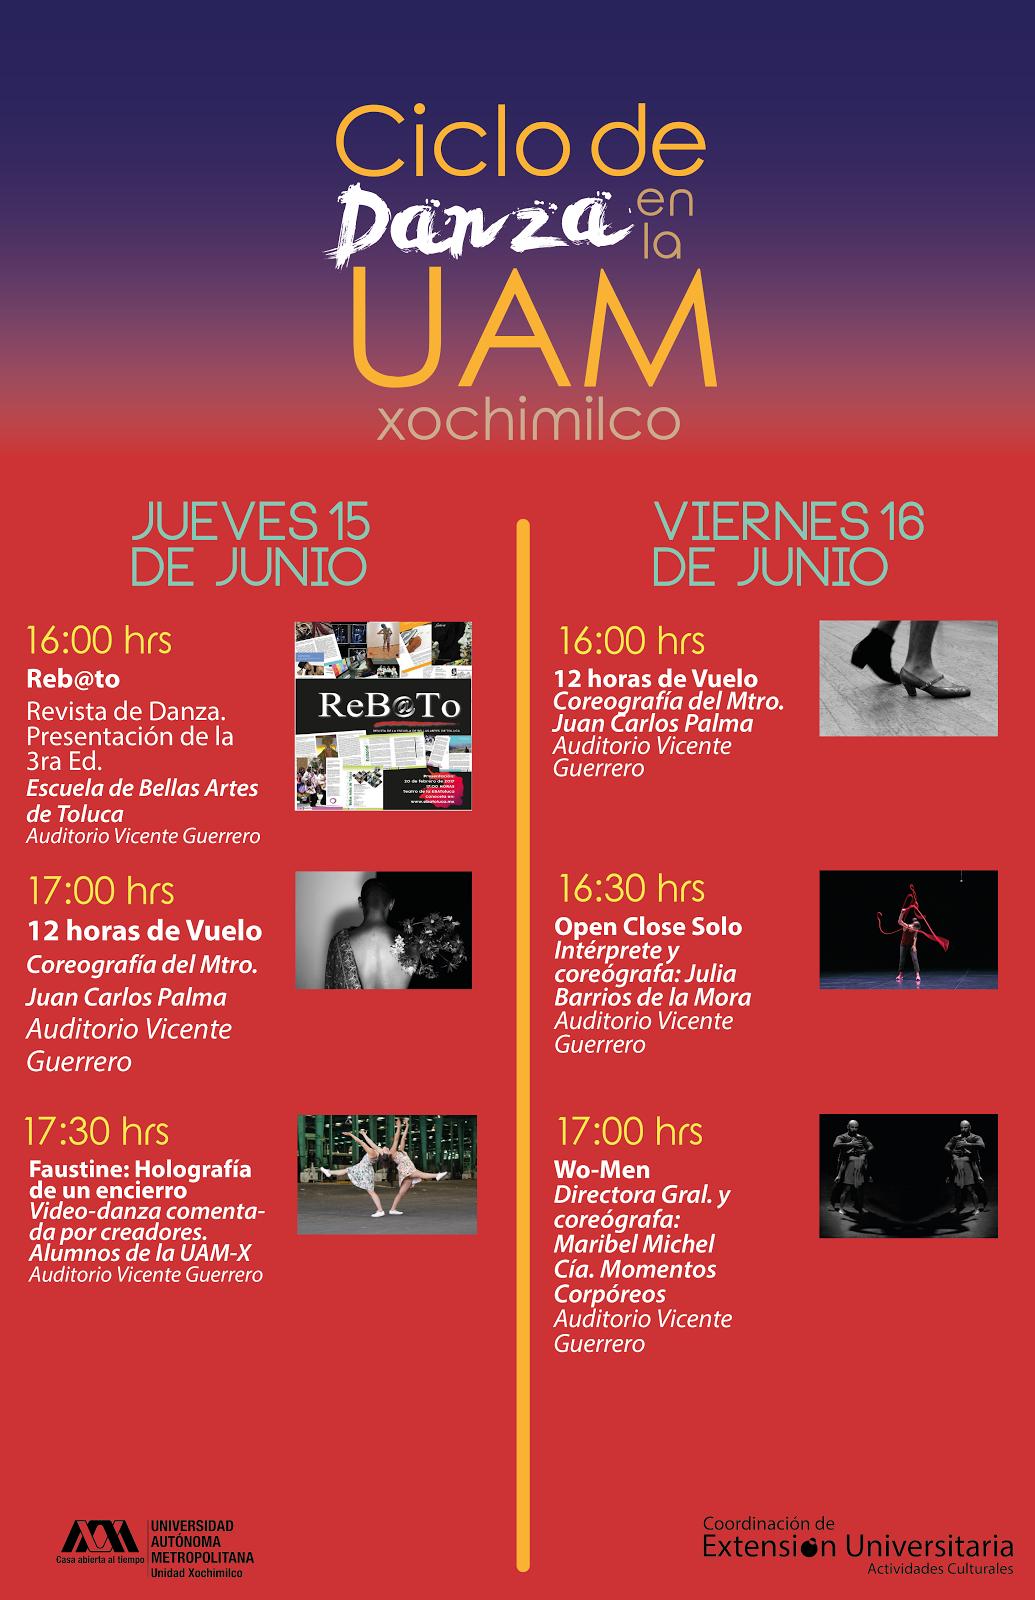 Ciclo de Danza UAM